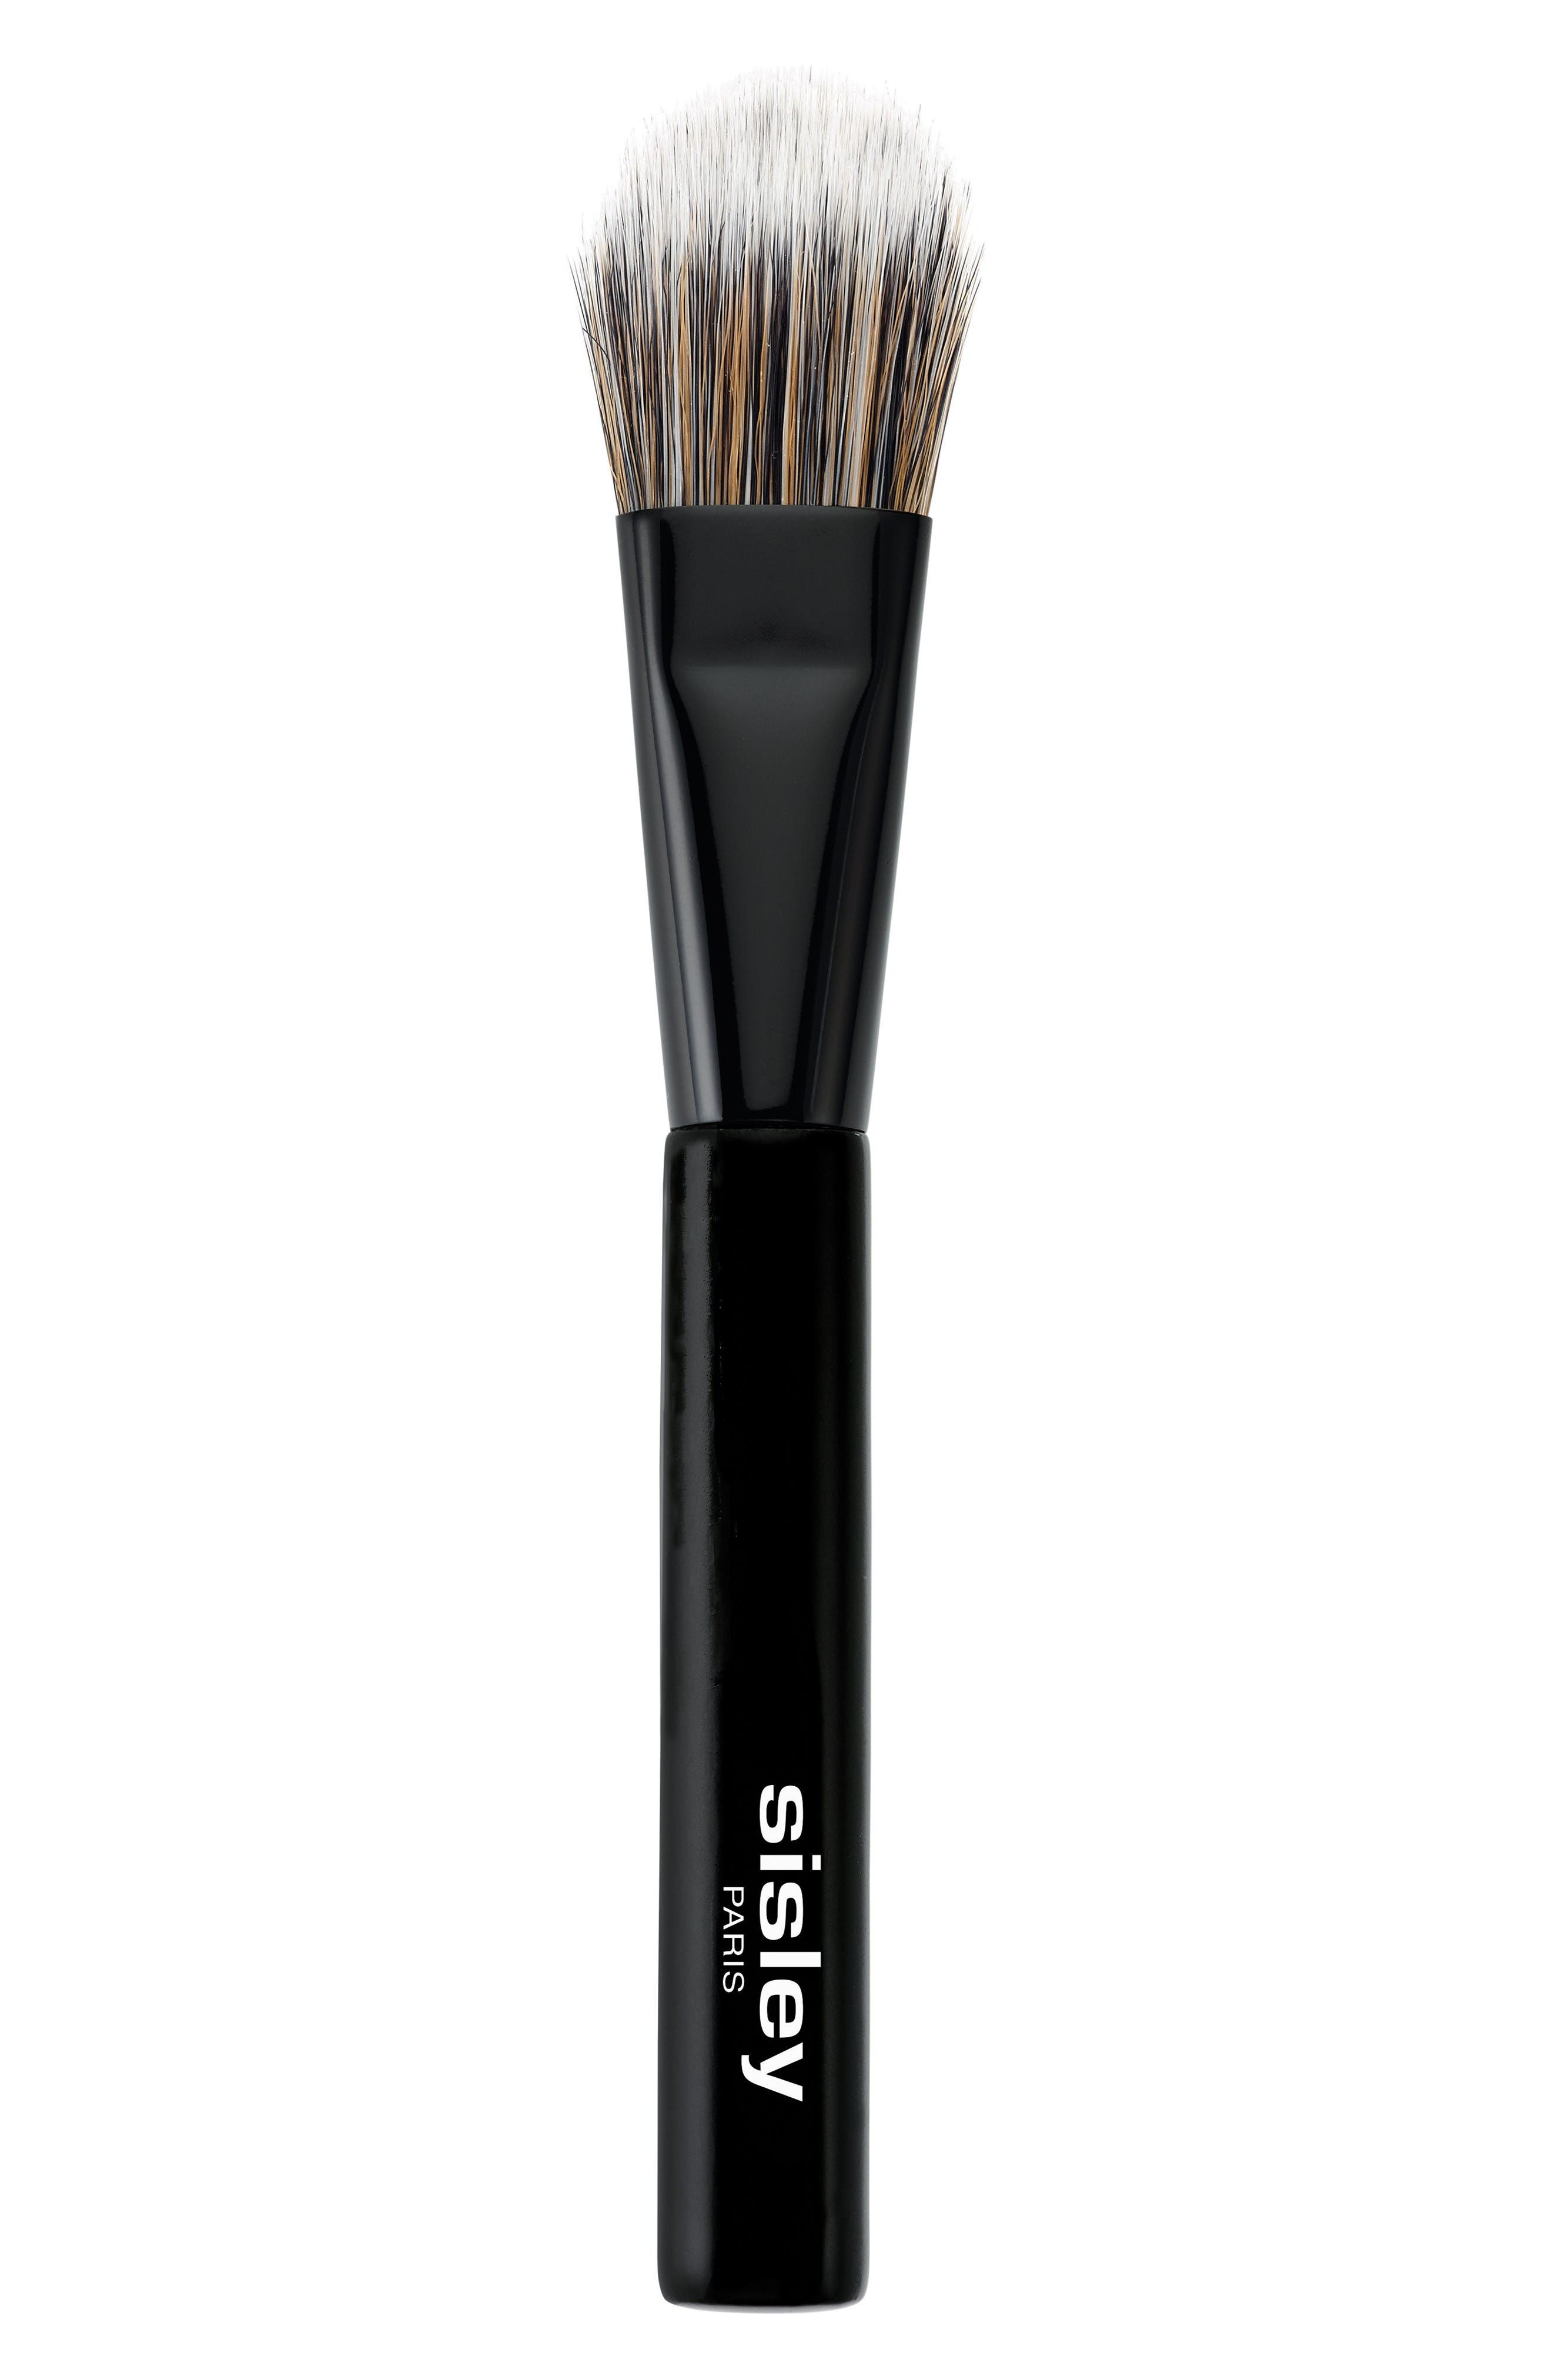 Sisley Paris Fluid Foundation Brush